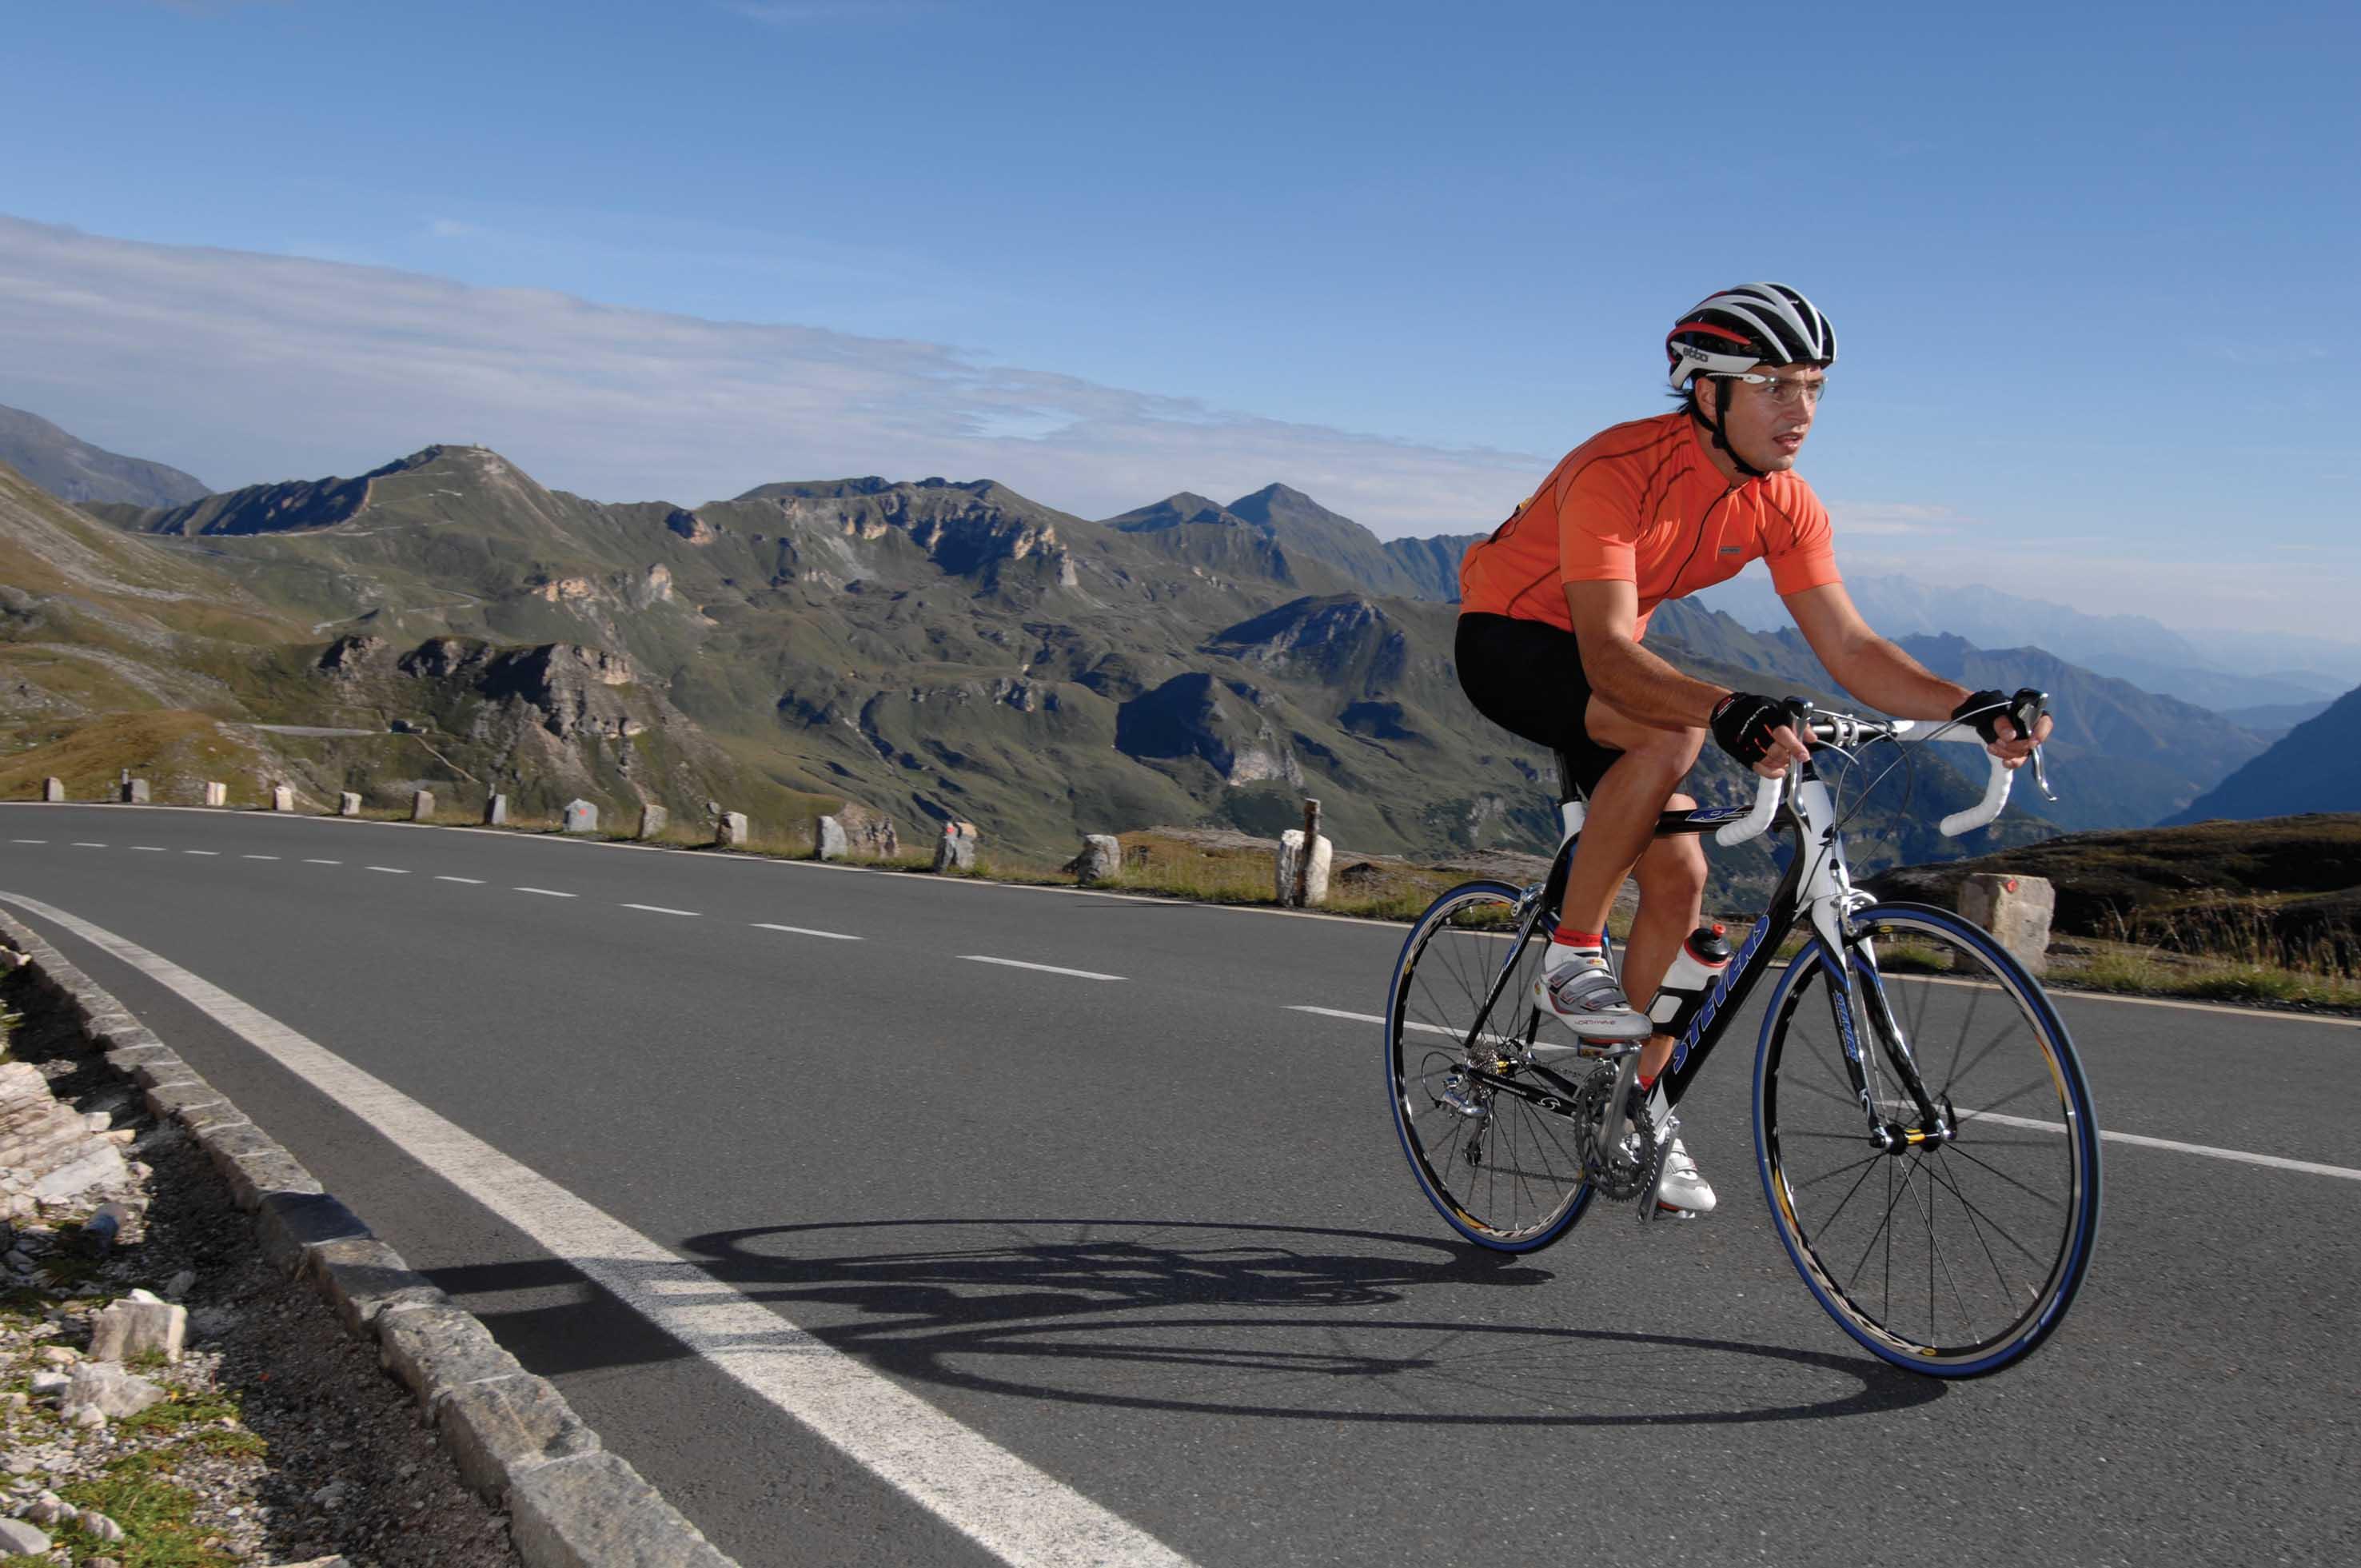 Alpe-Adria Bikefestival 2014